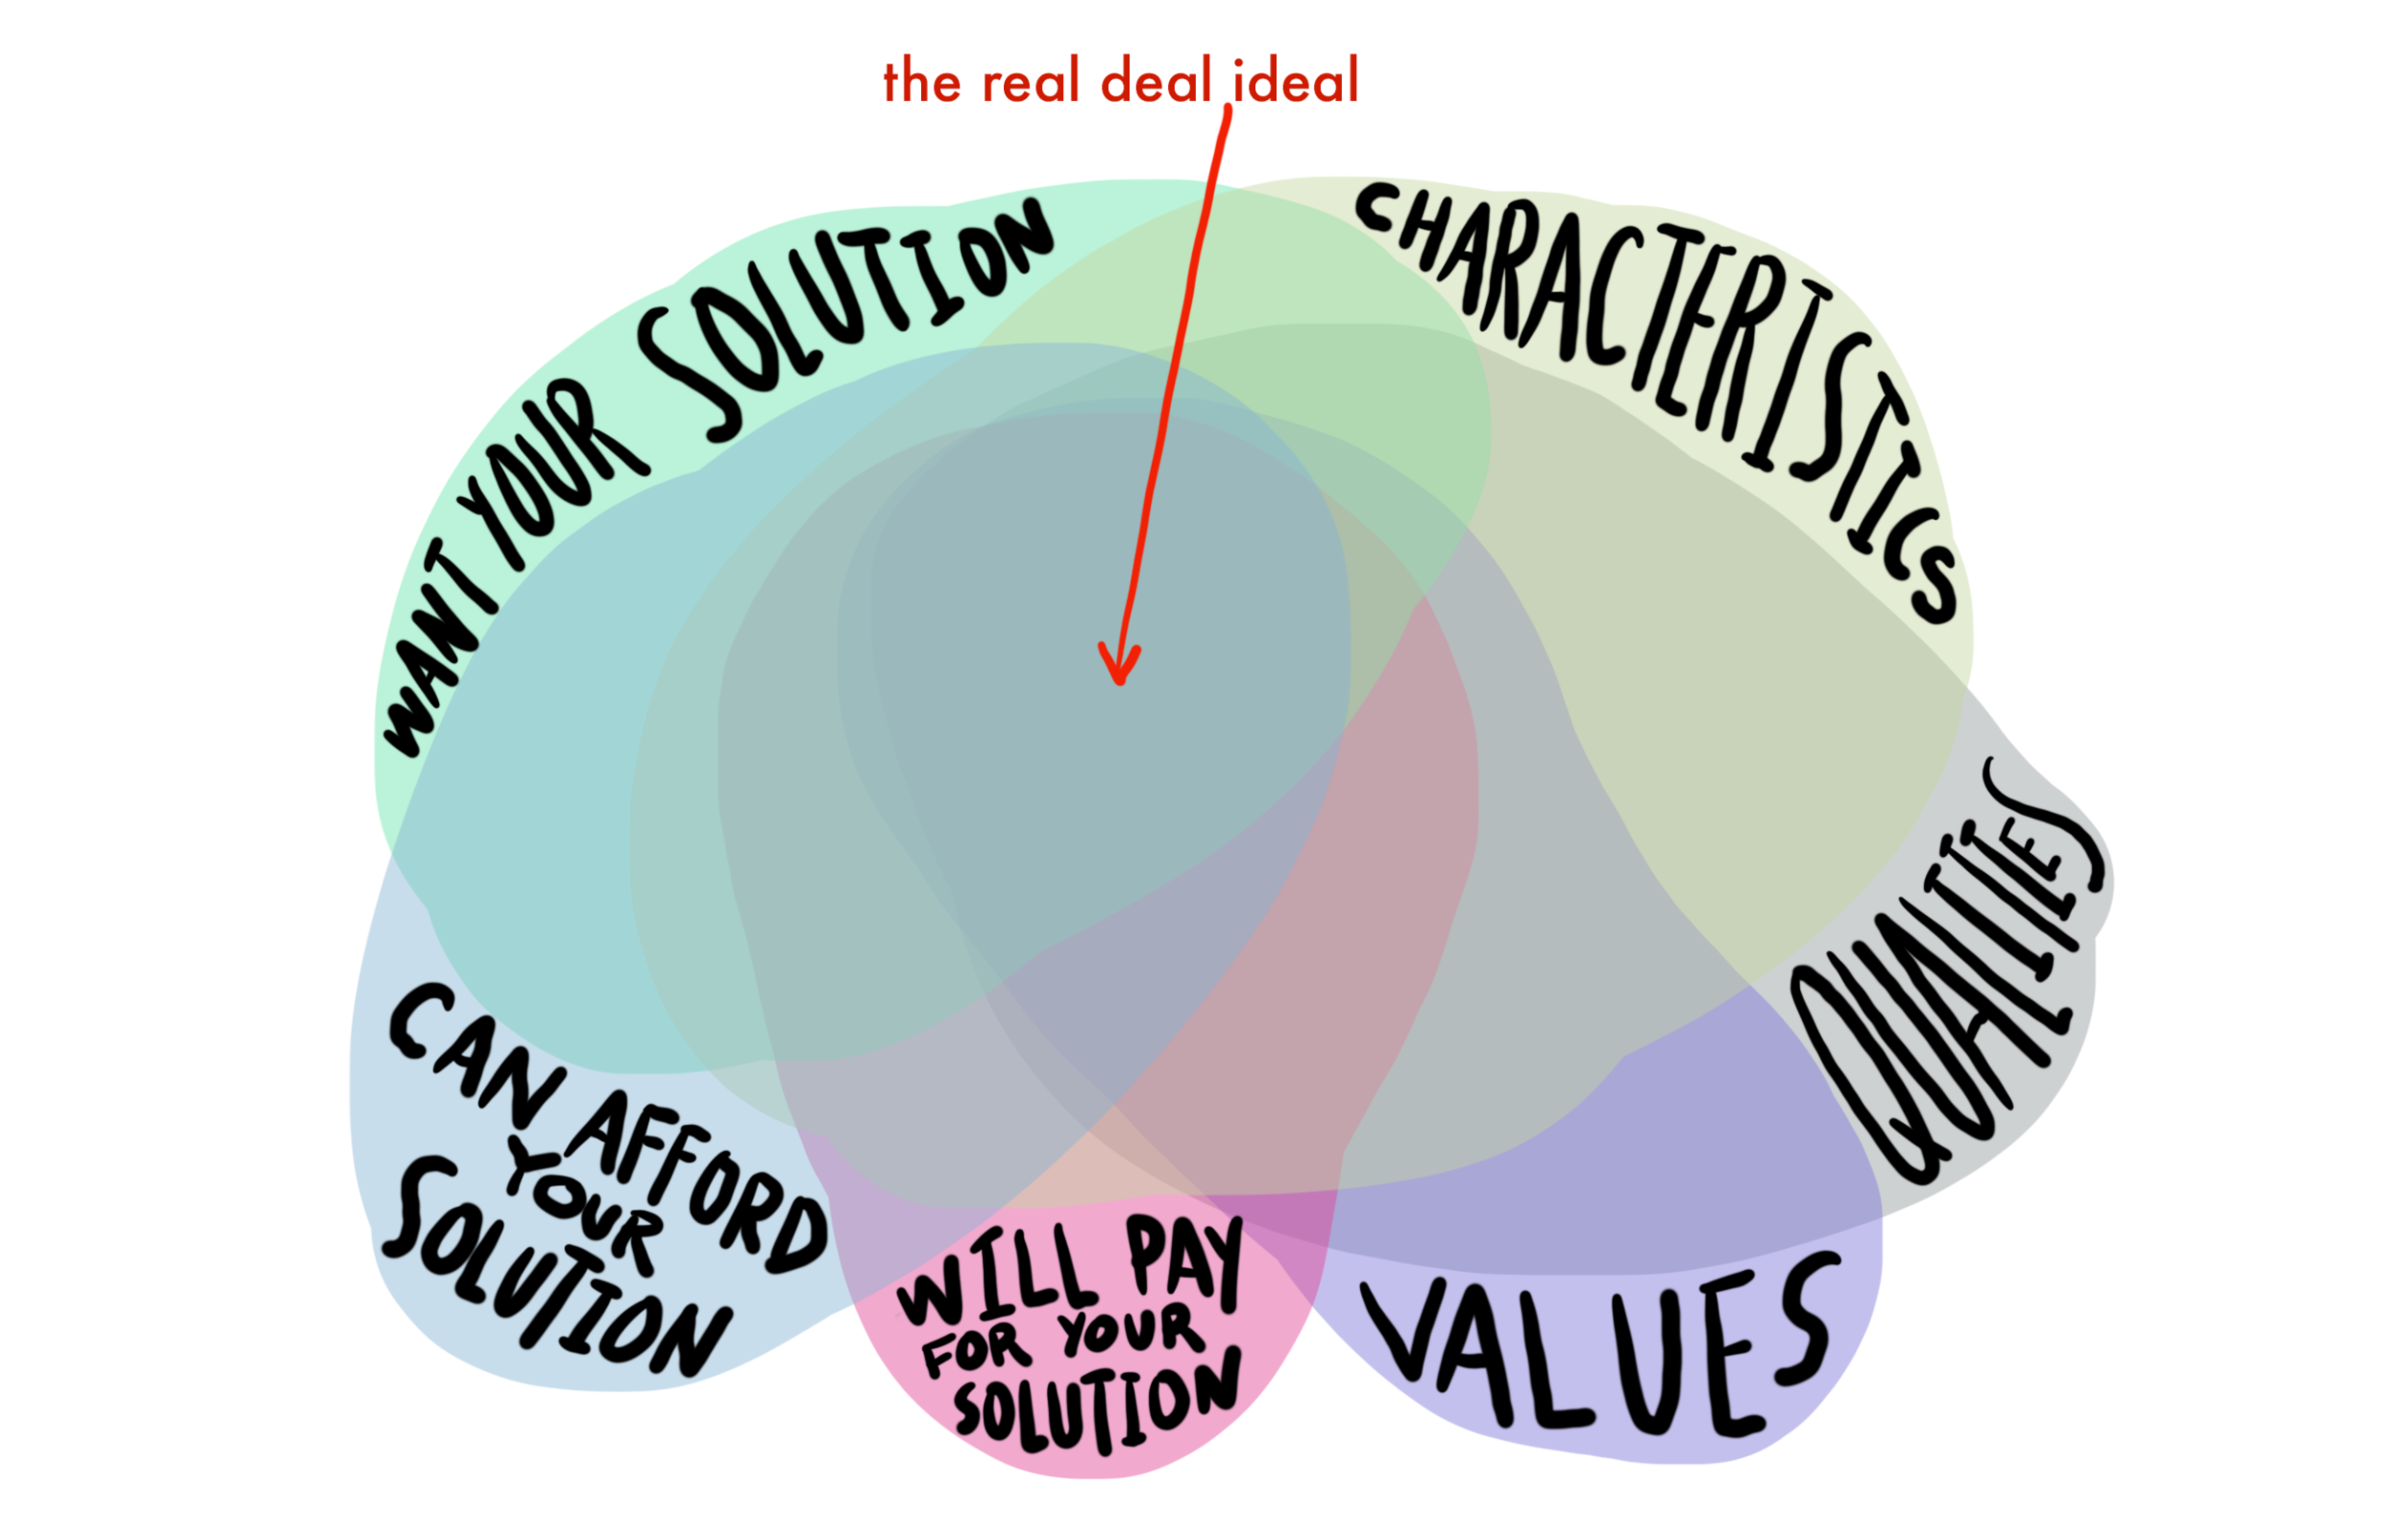 The ideal client venn diagram